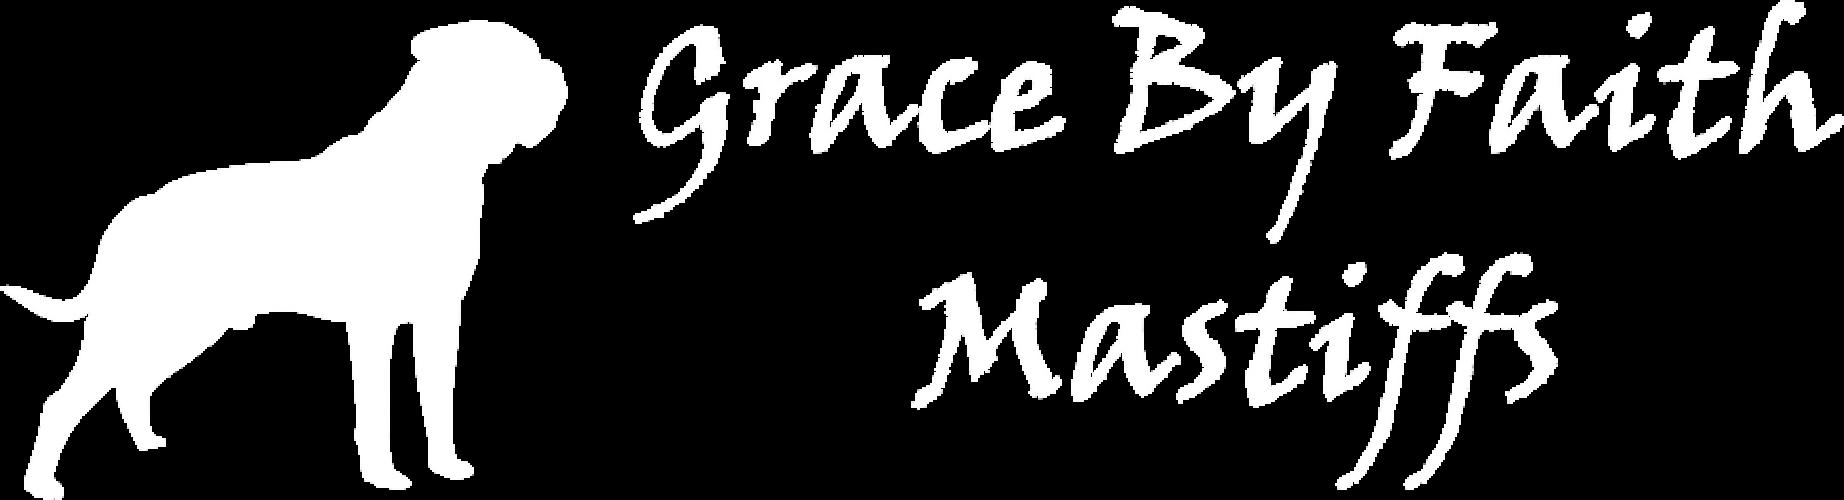 site-logo-with-white